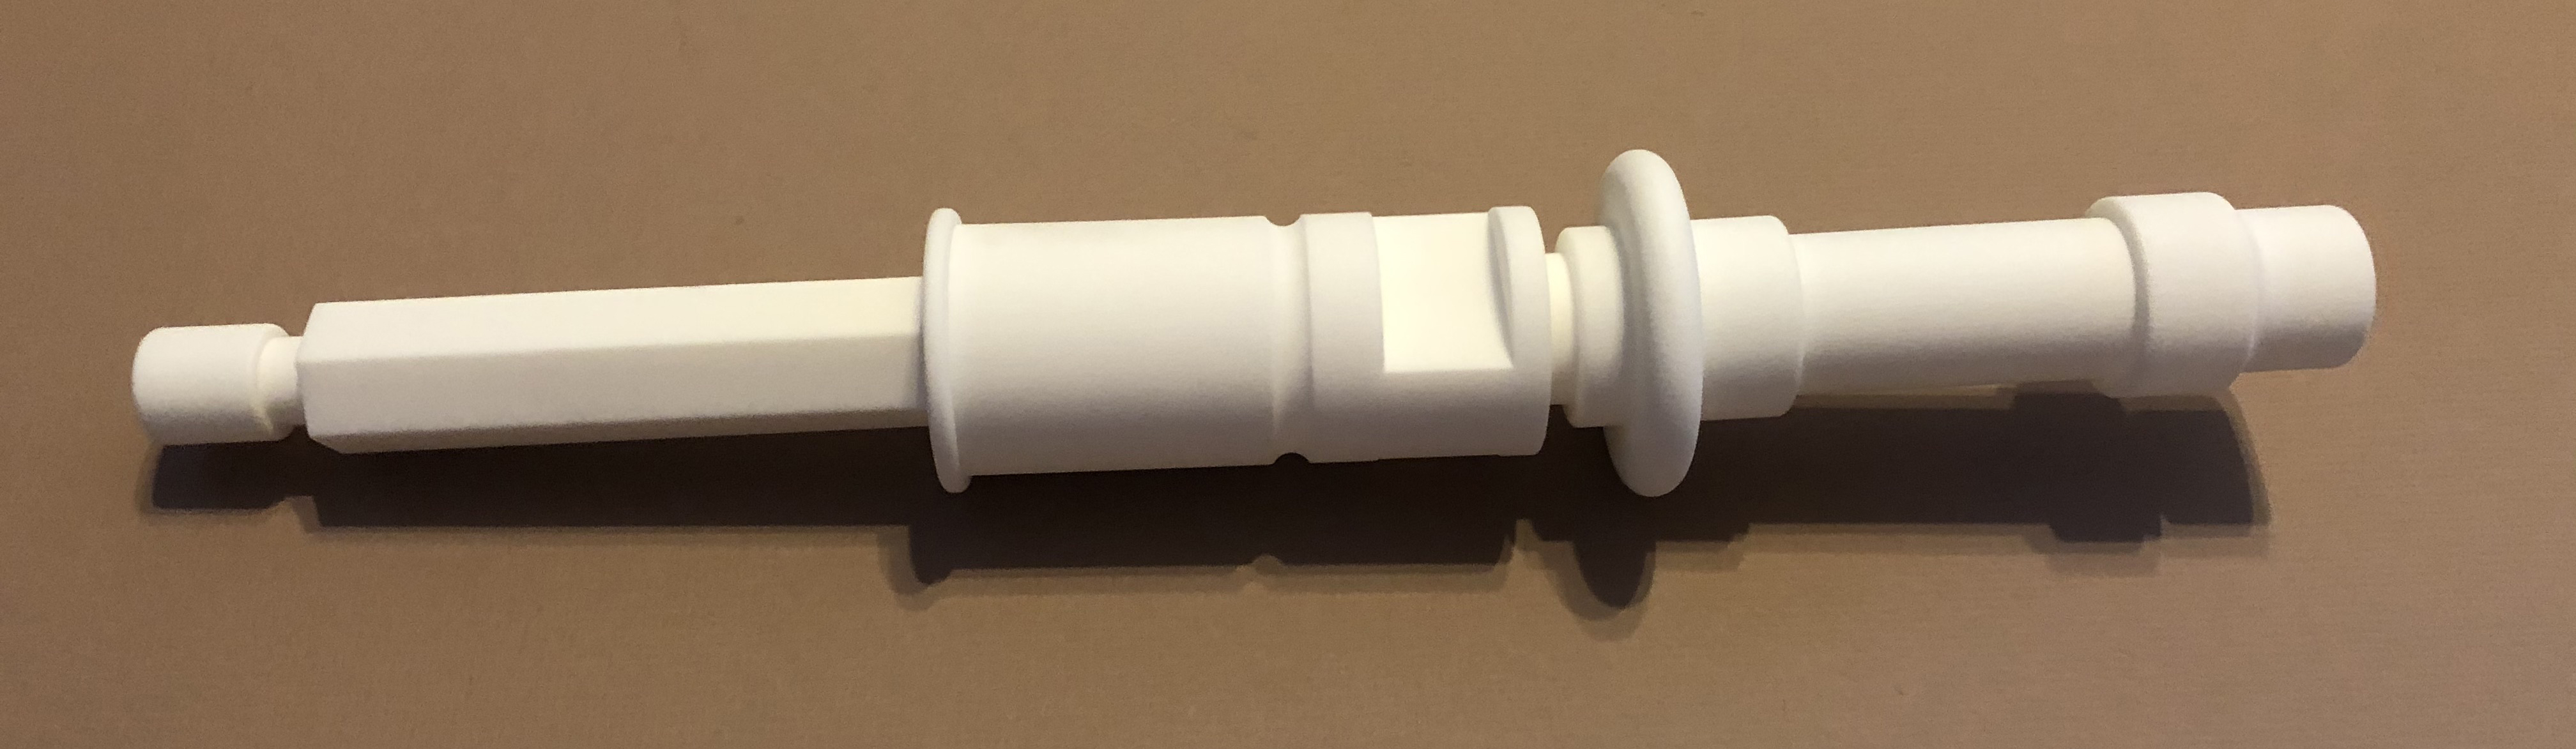 Hydrospanner test print.jpg